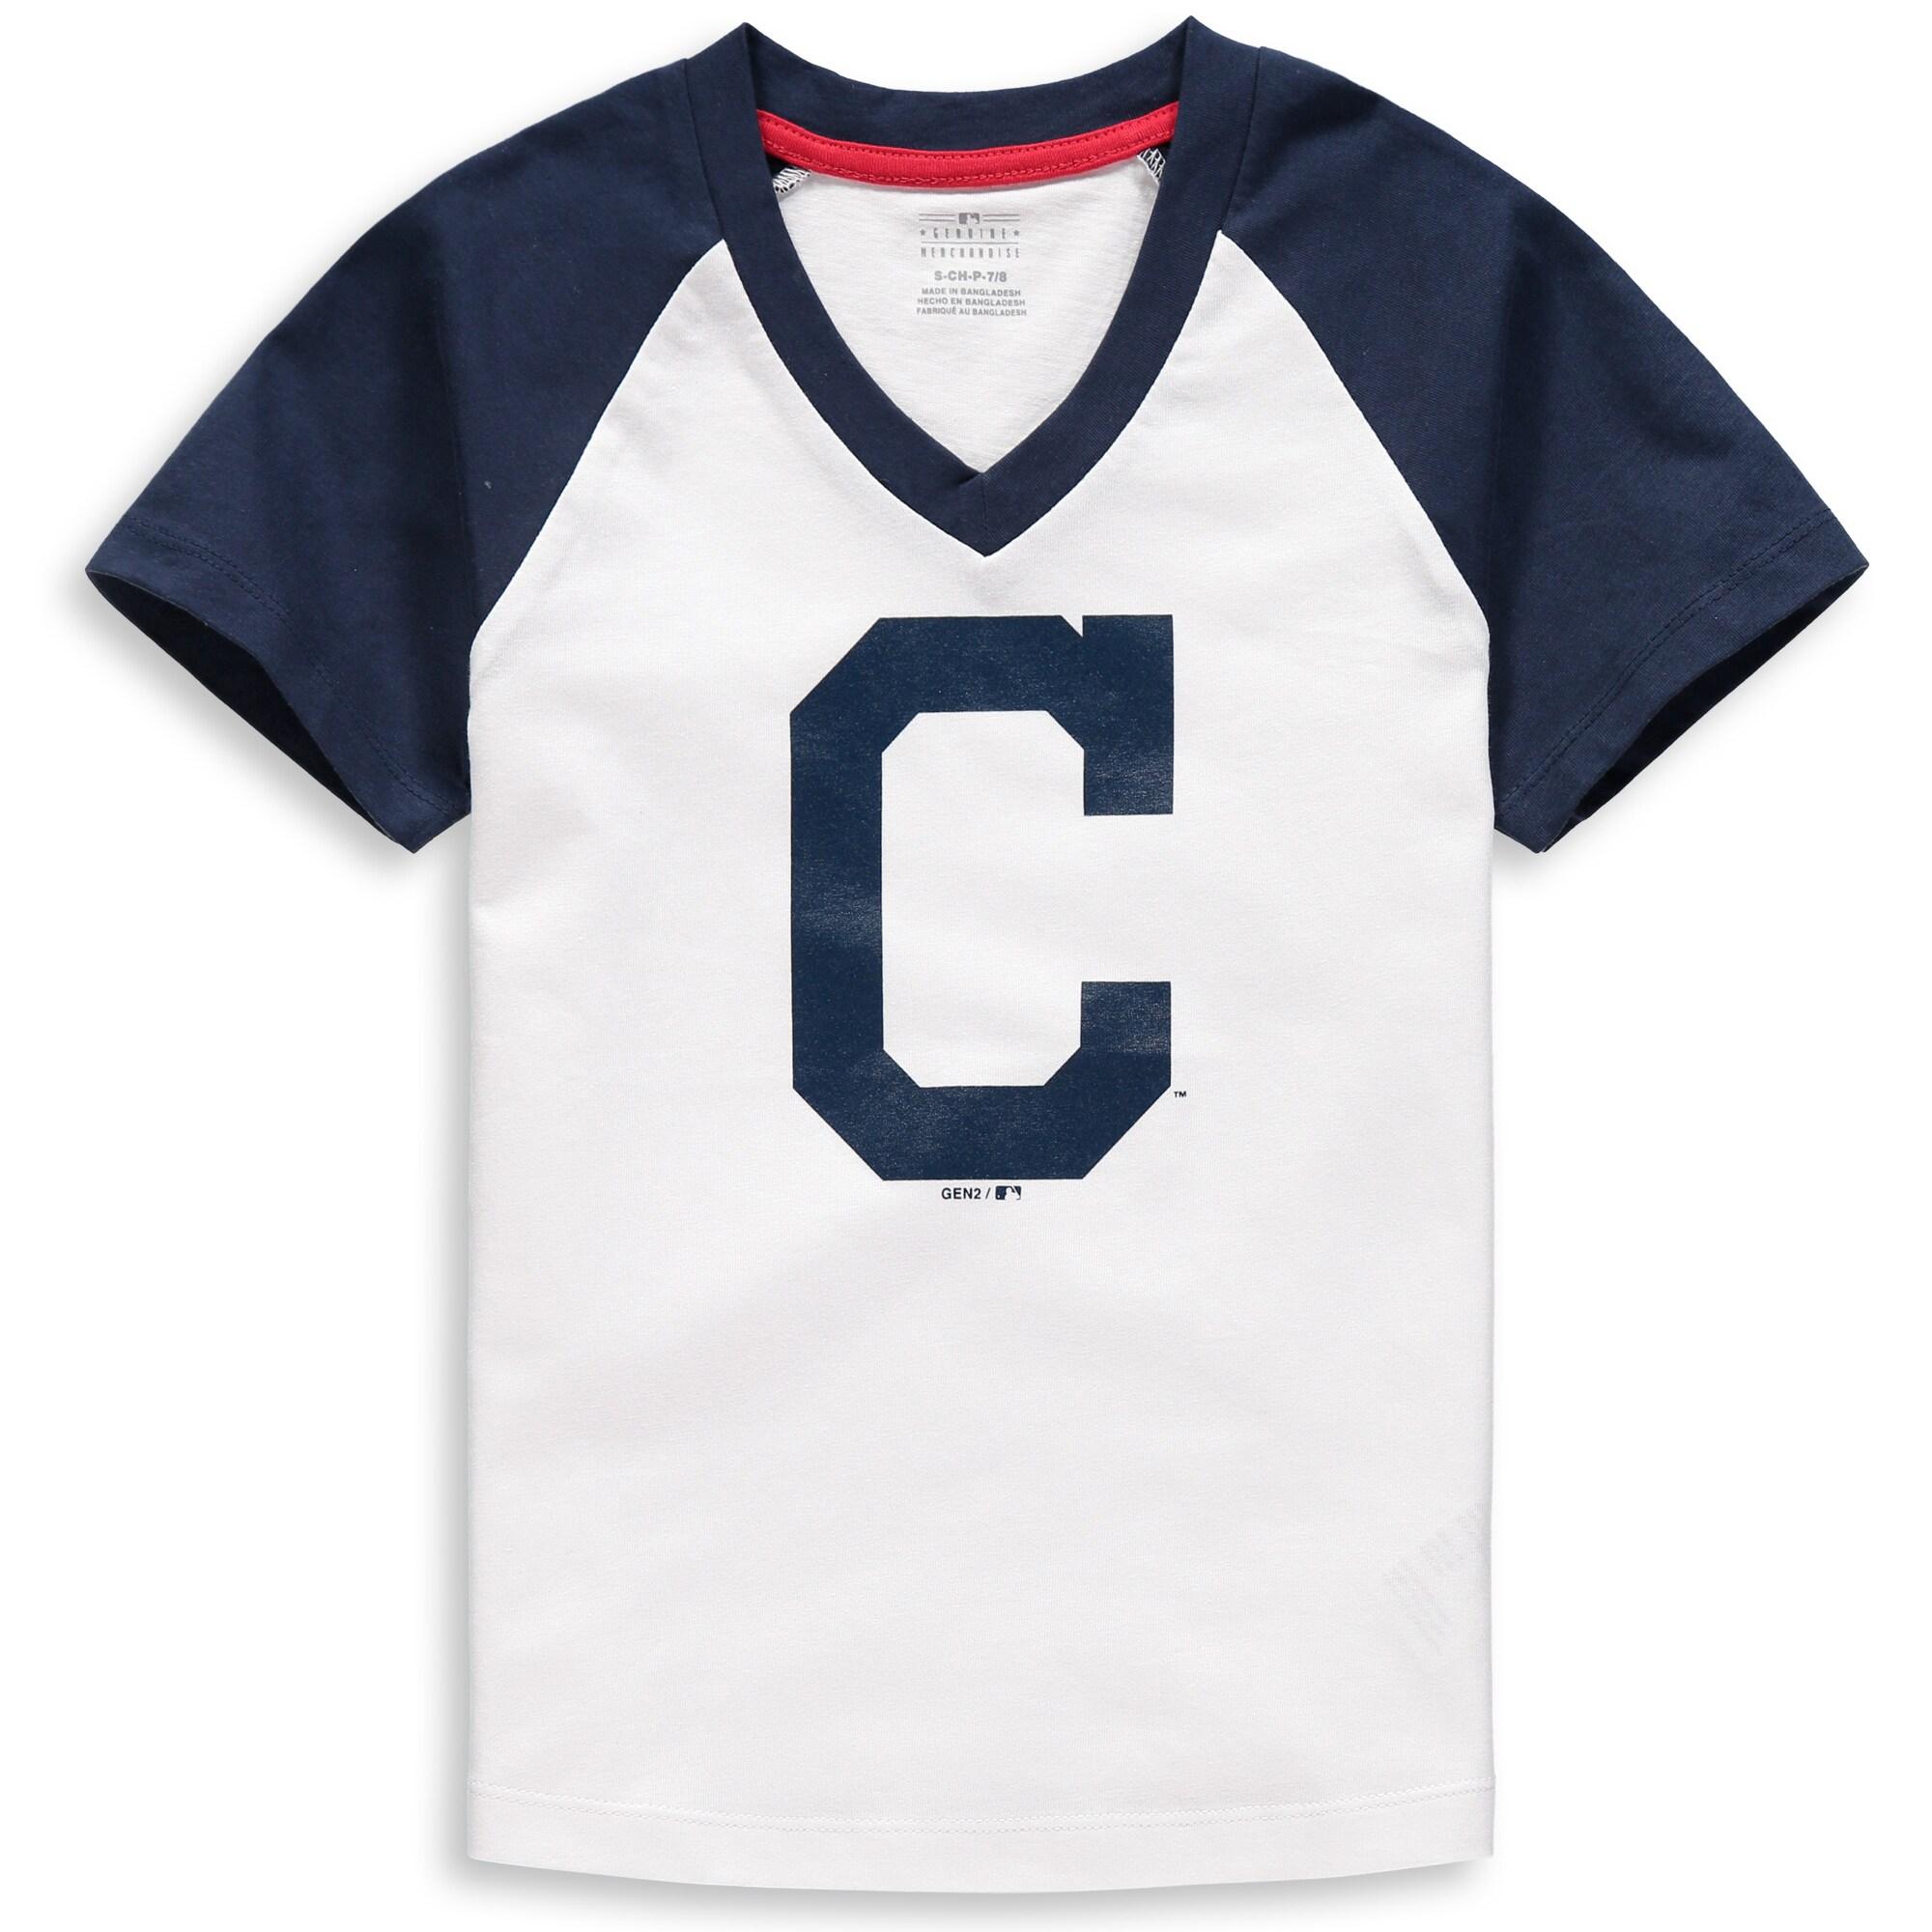 Cleveland Indians Girls Youth Back-to-Back V-Neck T-Shirt - White/Navy